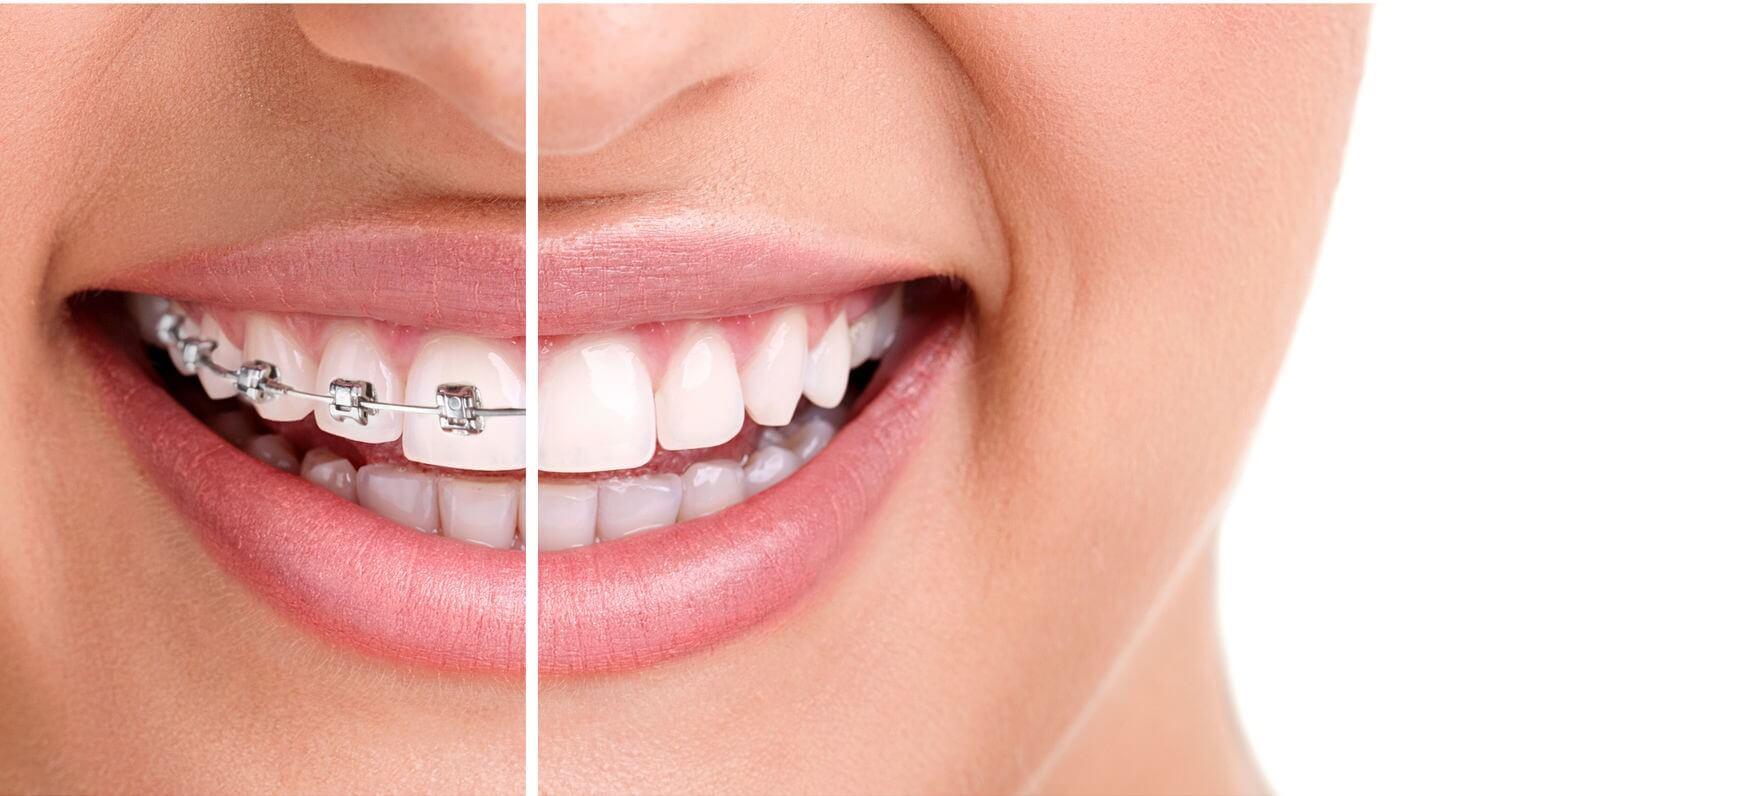 Orthodontist carrollton TX  orthodontist carrollton Orthodontist Carrollton orthodontist carrollton1 e1417019202879